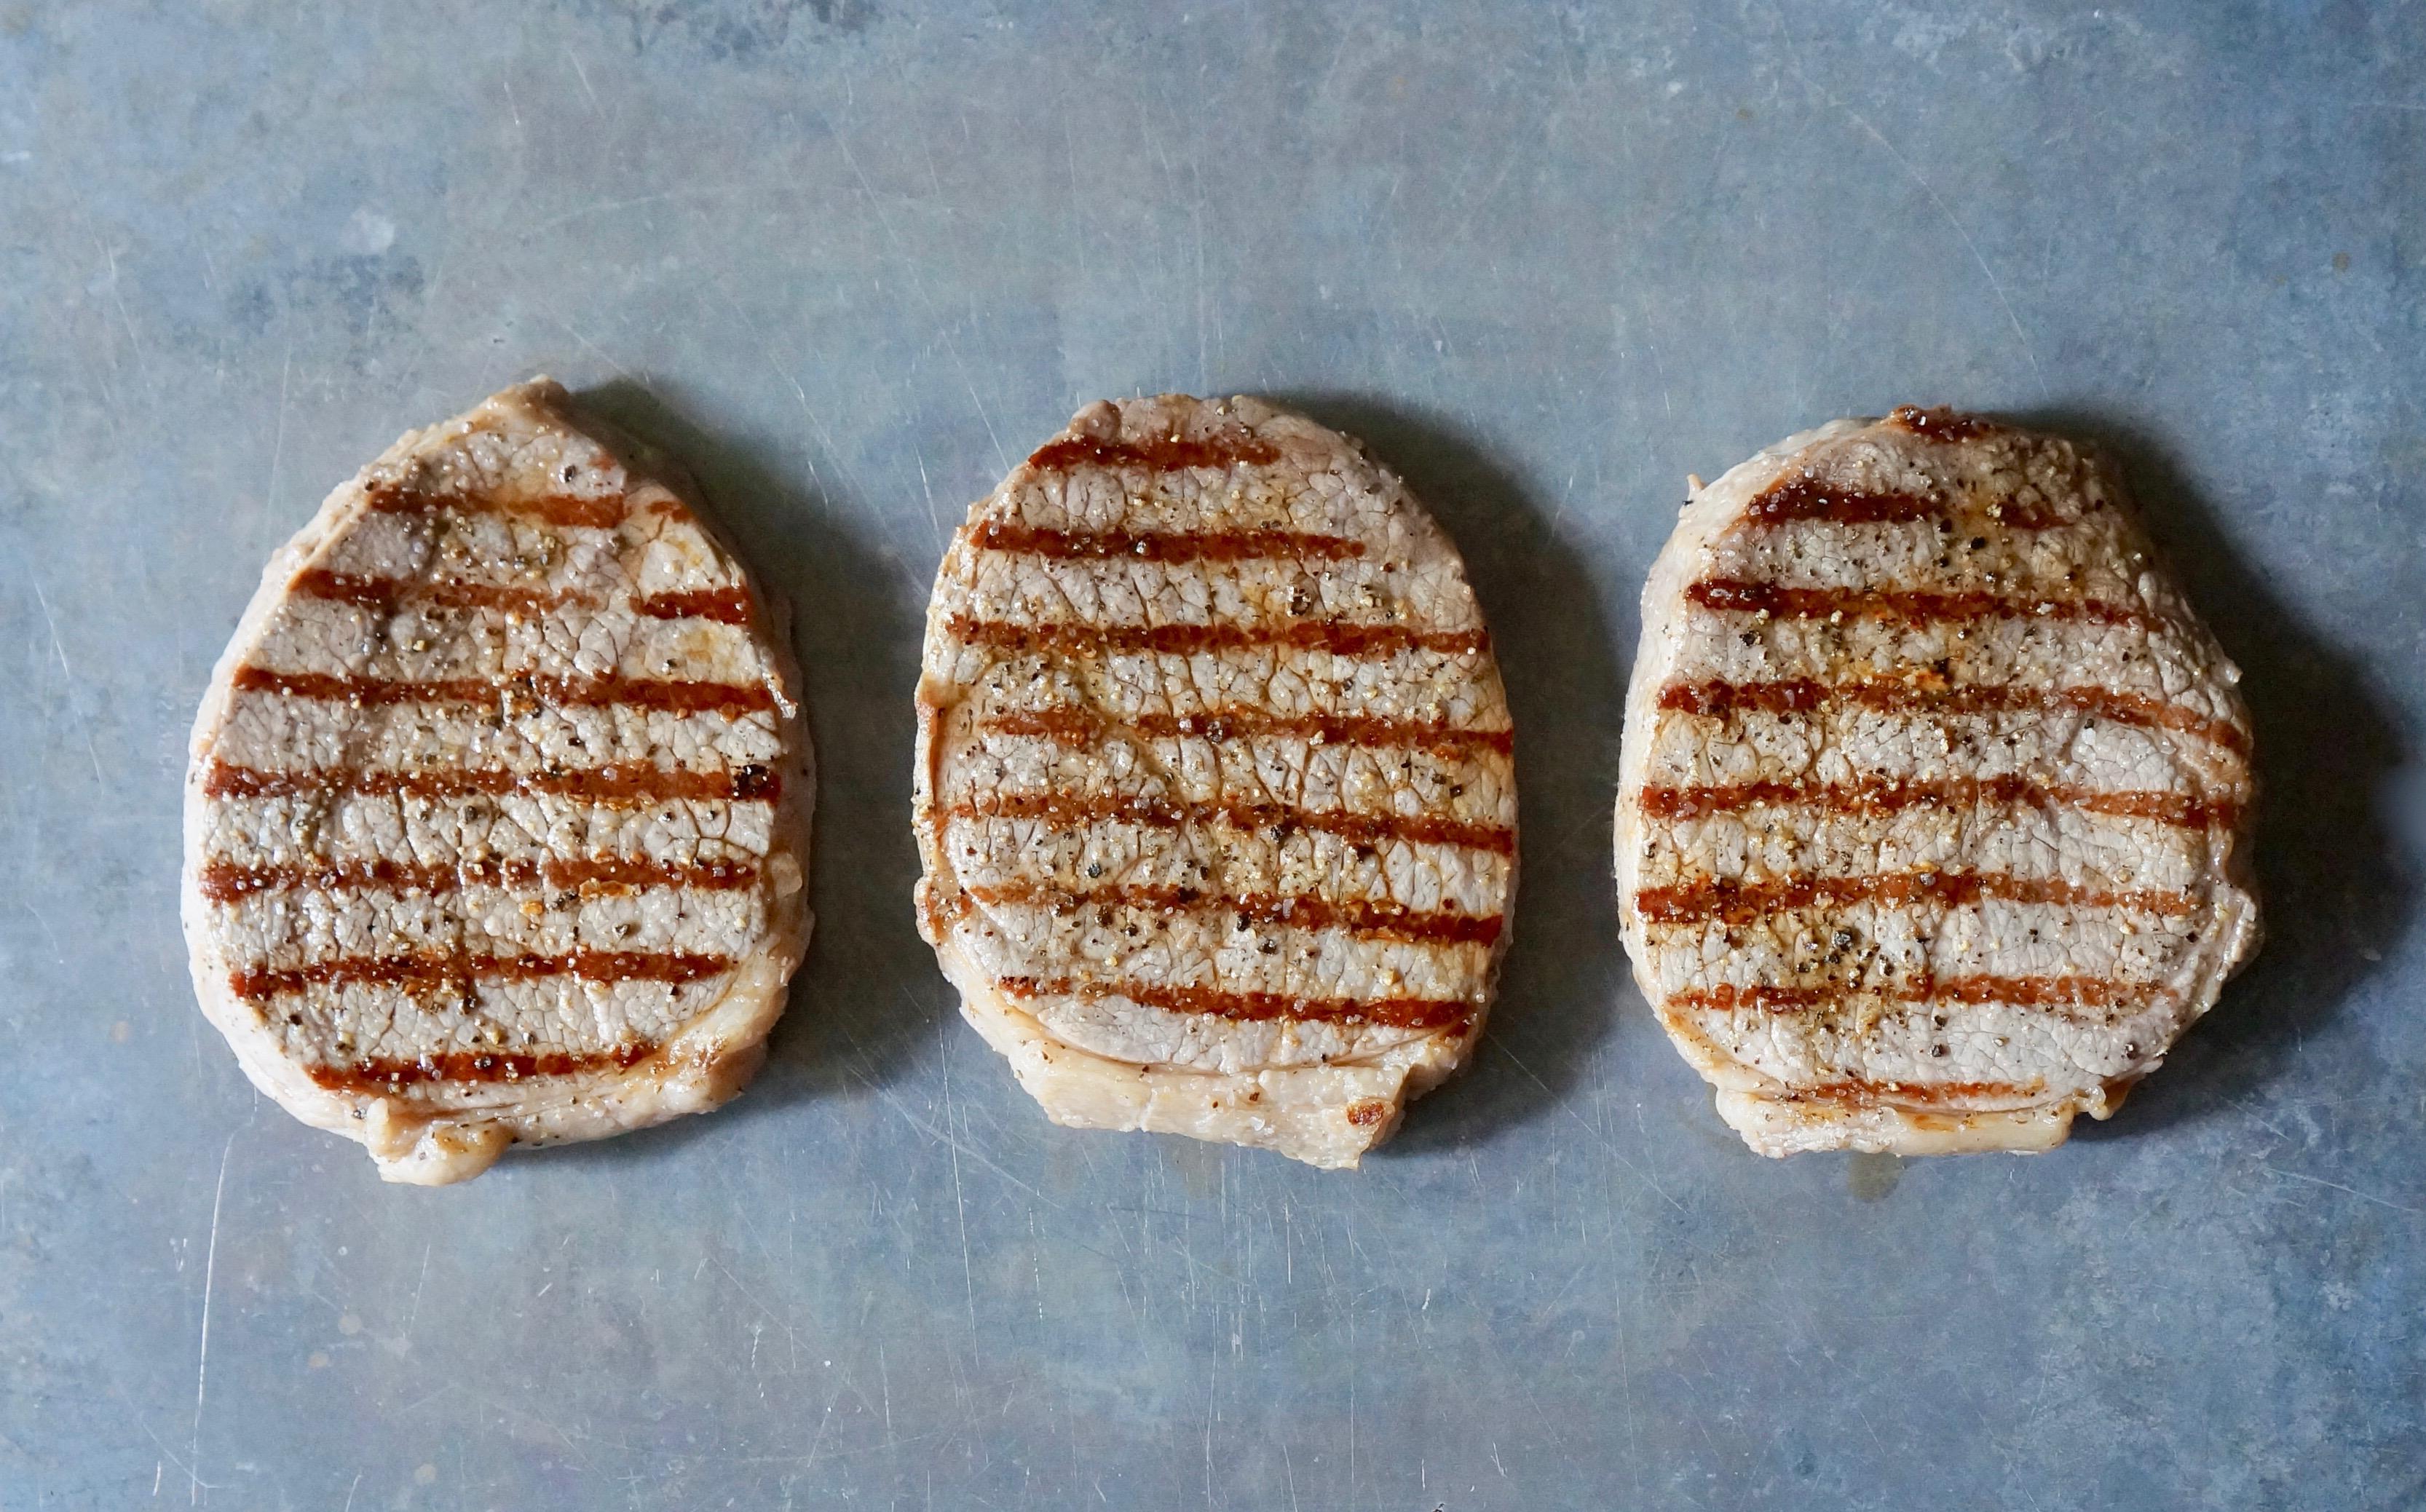 Steak Sandwich With Pickled Onions Rebecca Gordon Publisher Buttermilk Lipstick Culinary Entertaining Technique Southern Hostess-Eye Of Round Steaks-RebeccaGordon-Pastry-Chef-Birmingham-Alabama